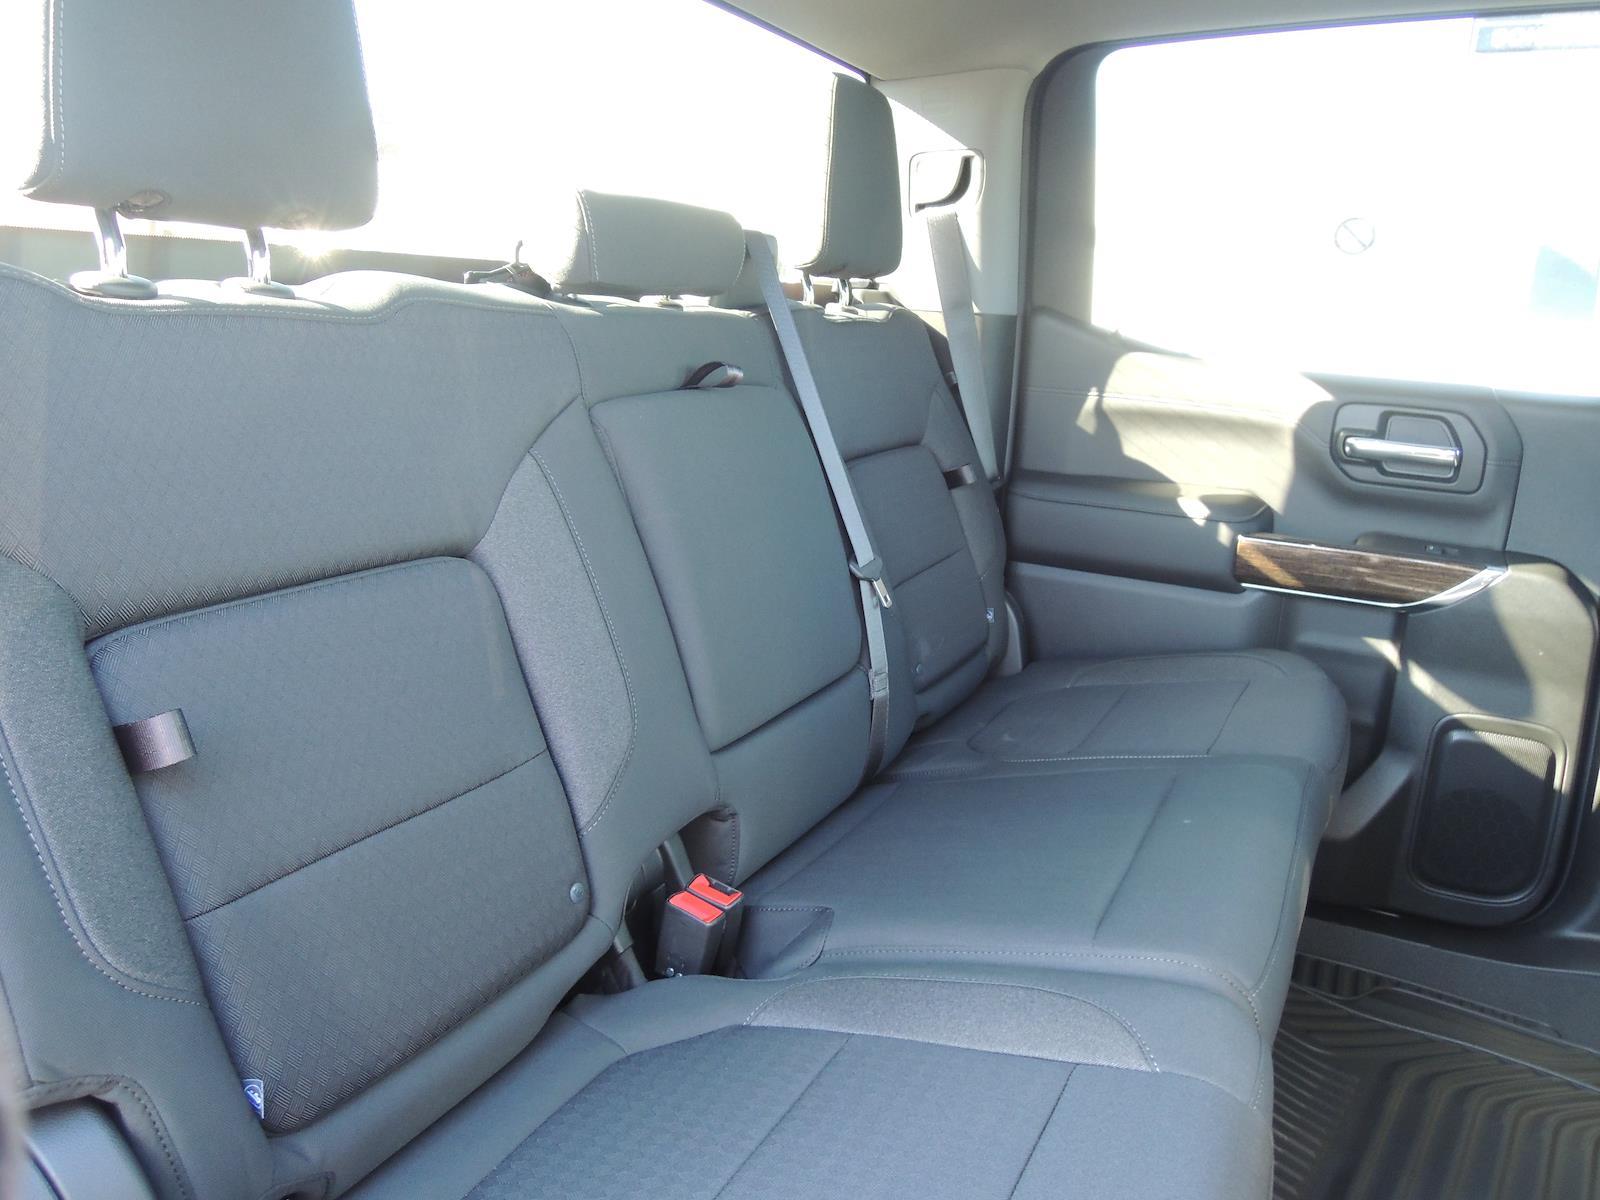 2021 GMC Sierra 1500 Crew Cab 4x4, Pickup #MT735 - photo 10